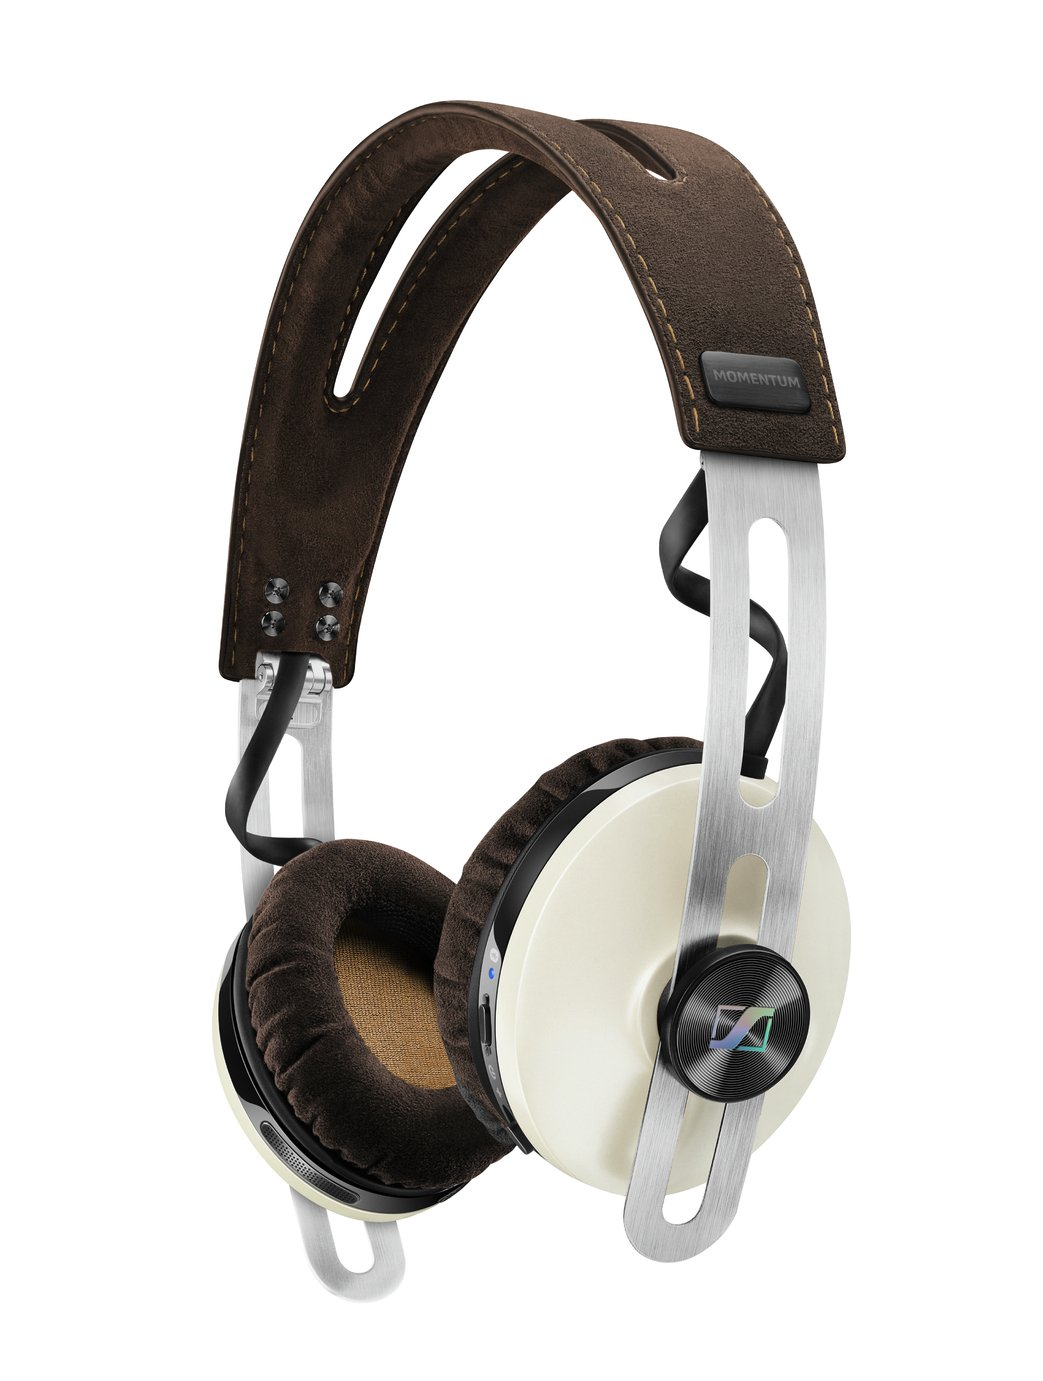 Sennheiser Momentum 2.0 On-Ear Wireless Headphones - Ivory